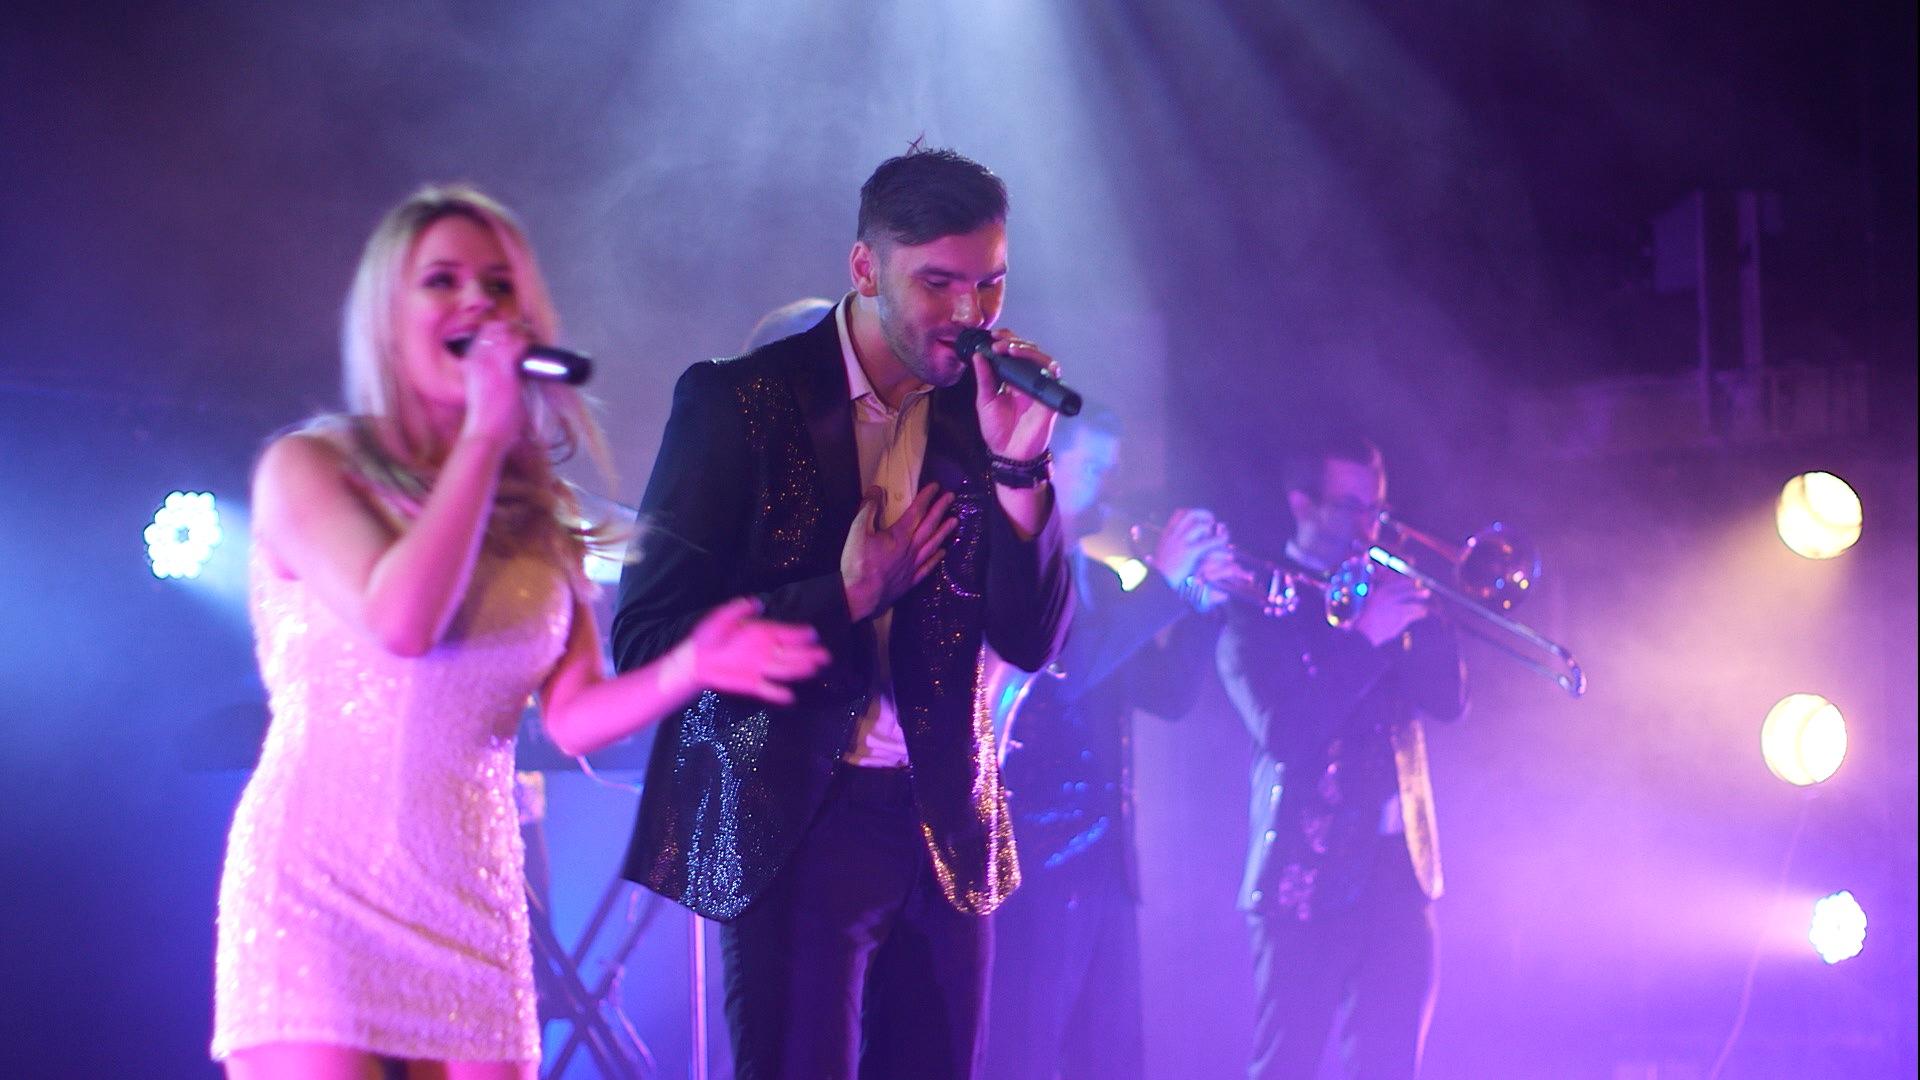 Jewish Hora Band